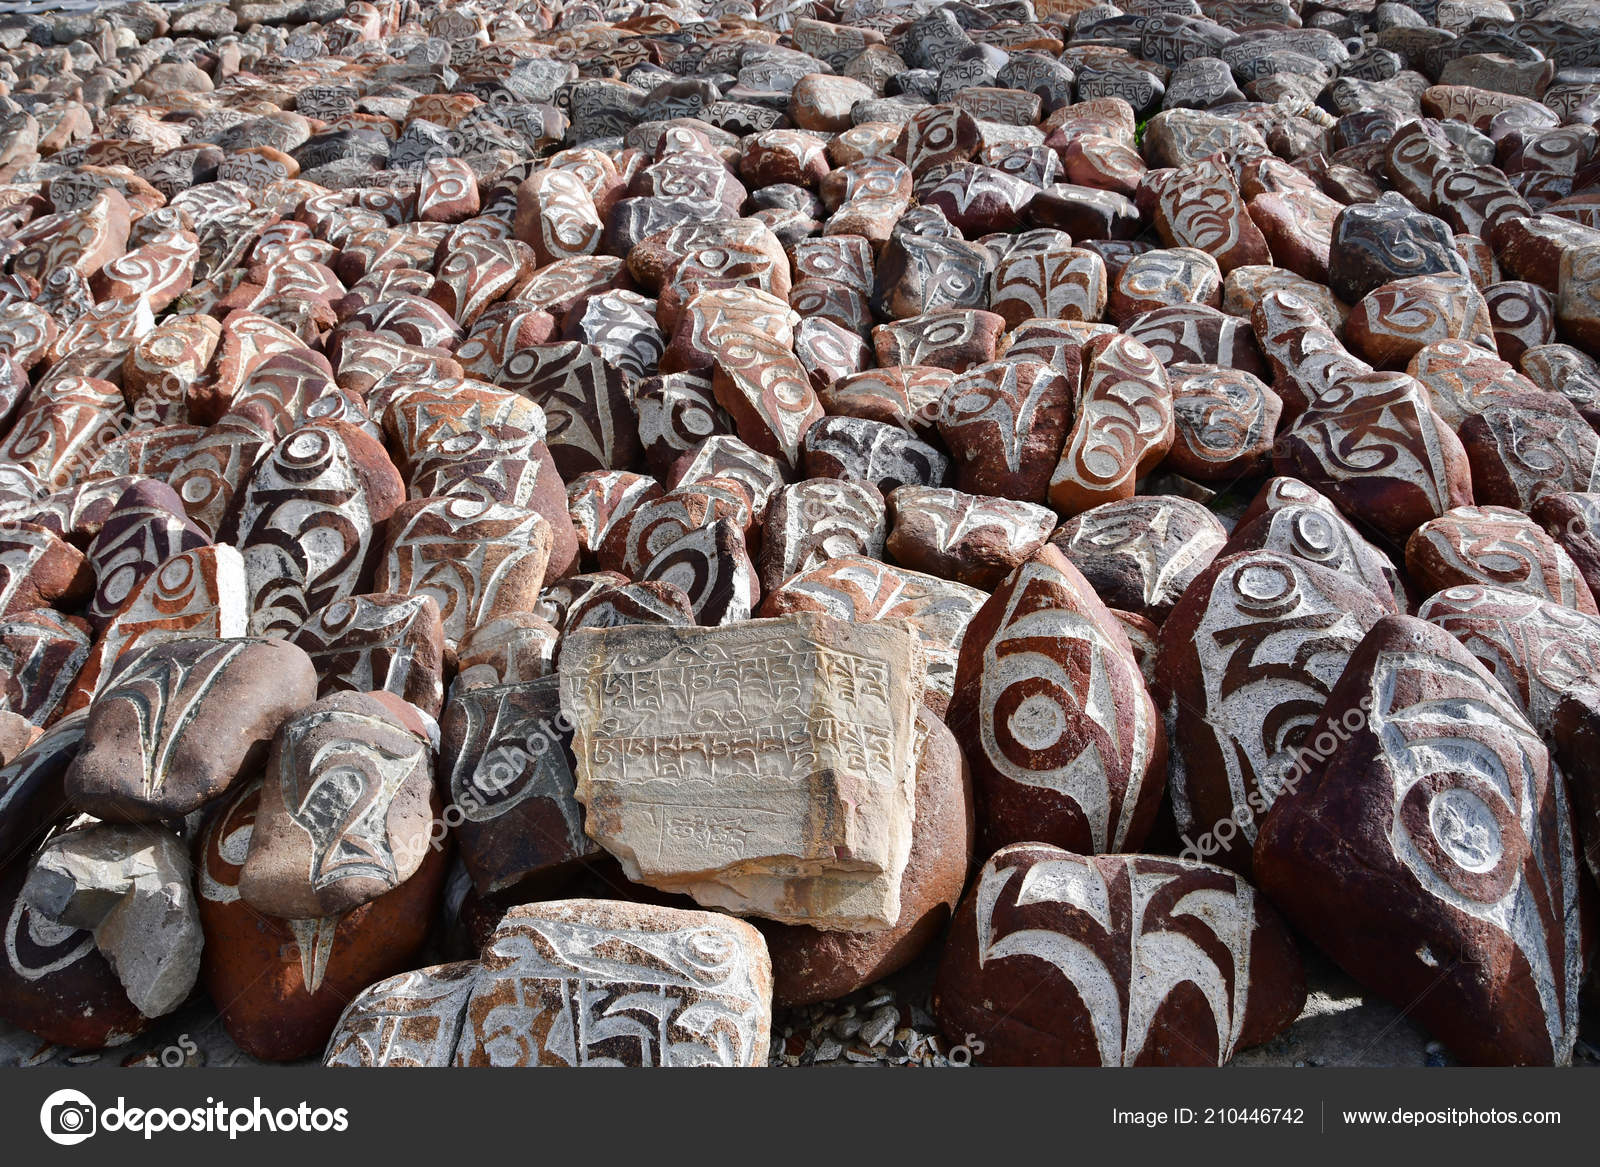 Tibet Buddhist Prayer Stones Mantras Ritual Drawings Trail